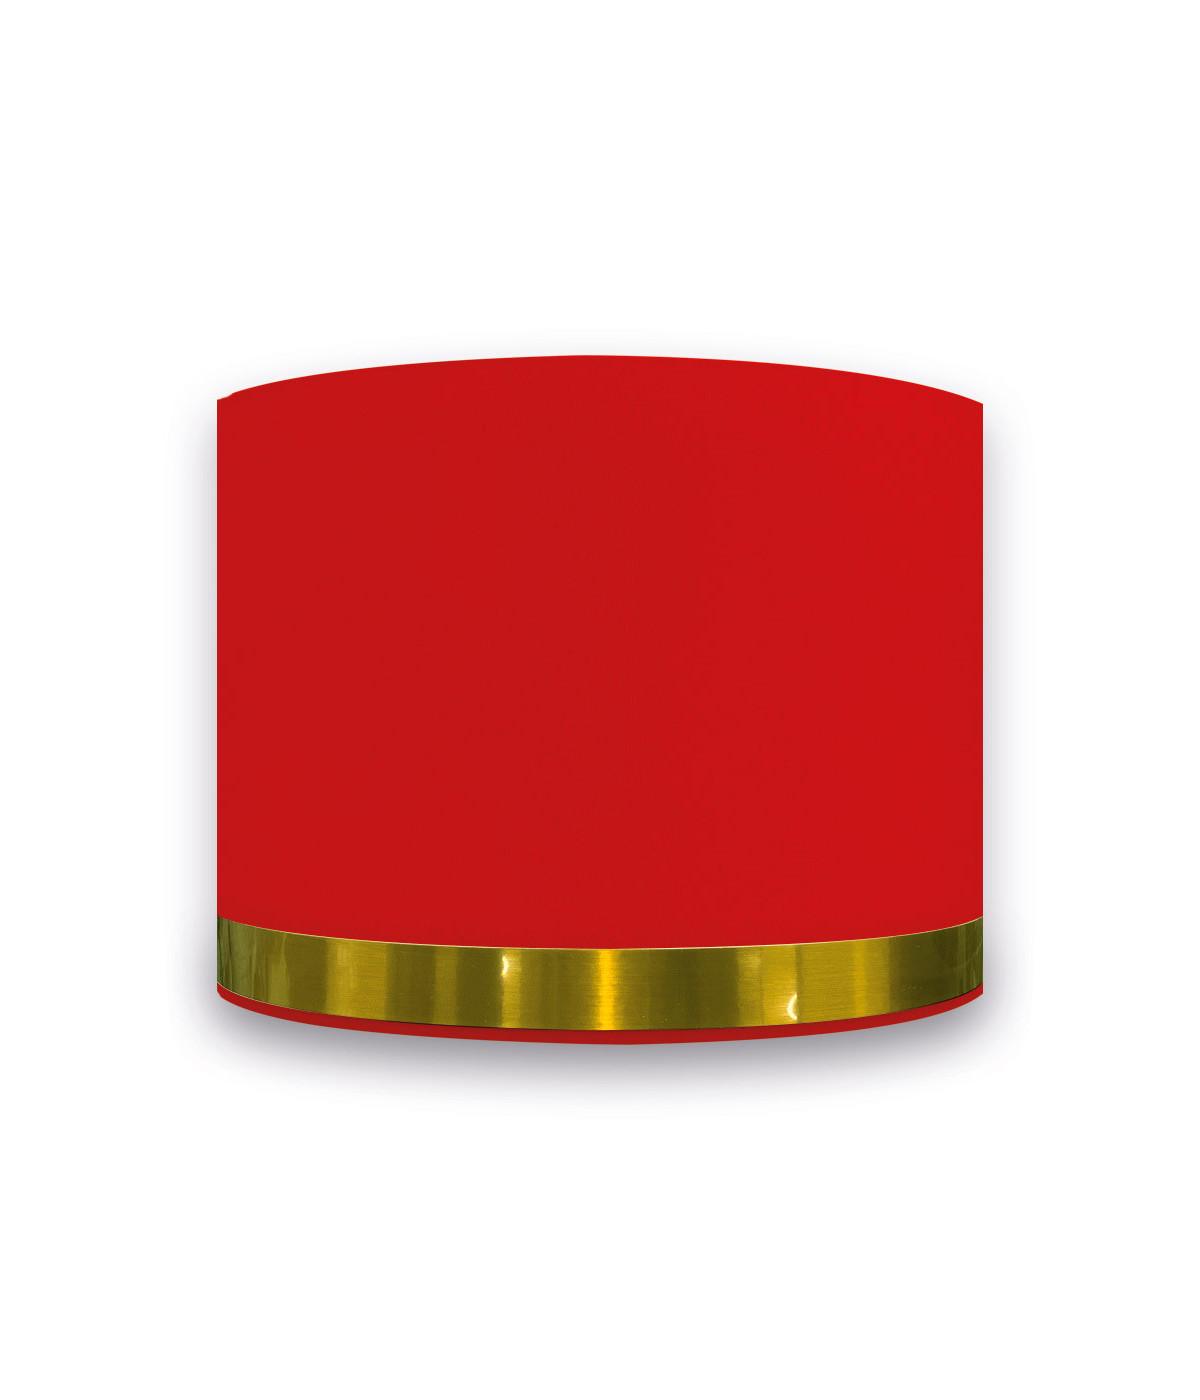 Abat-jour Rond Rouge Jonc Or